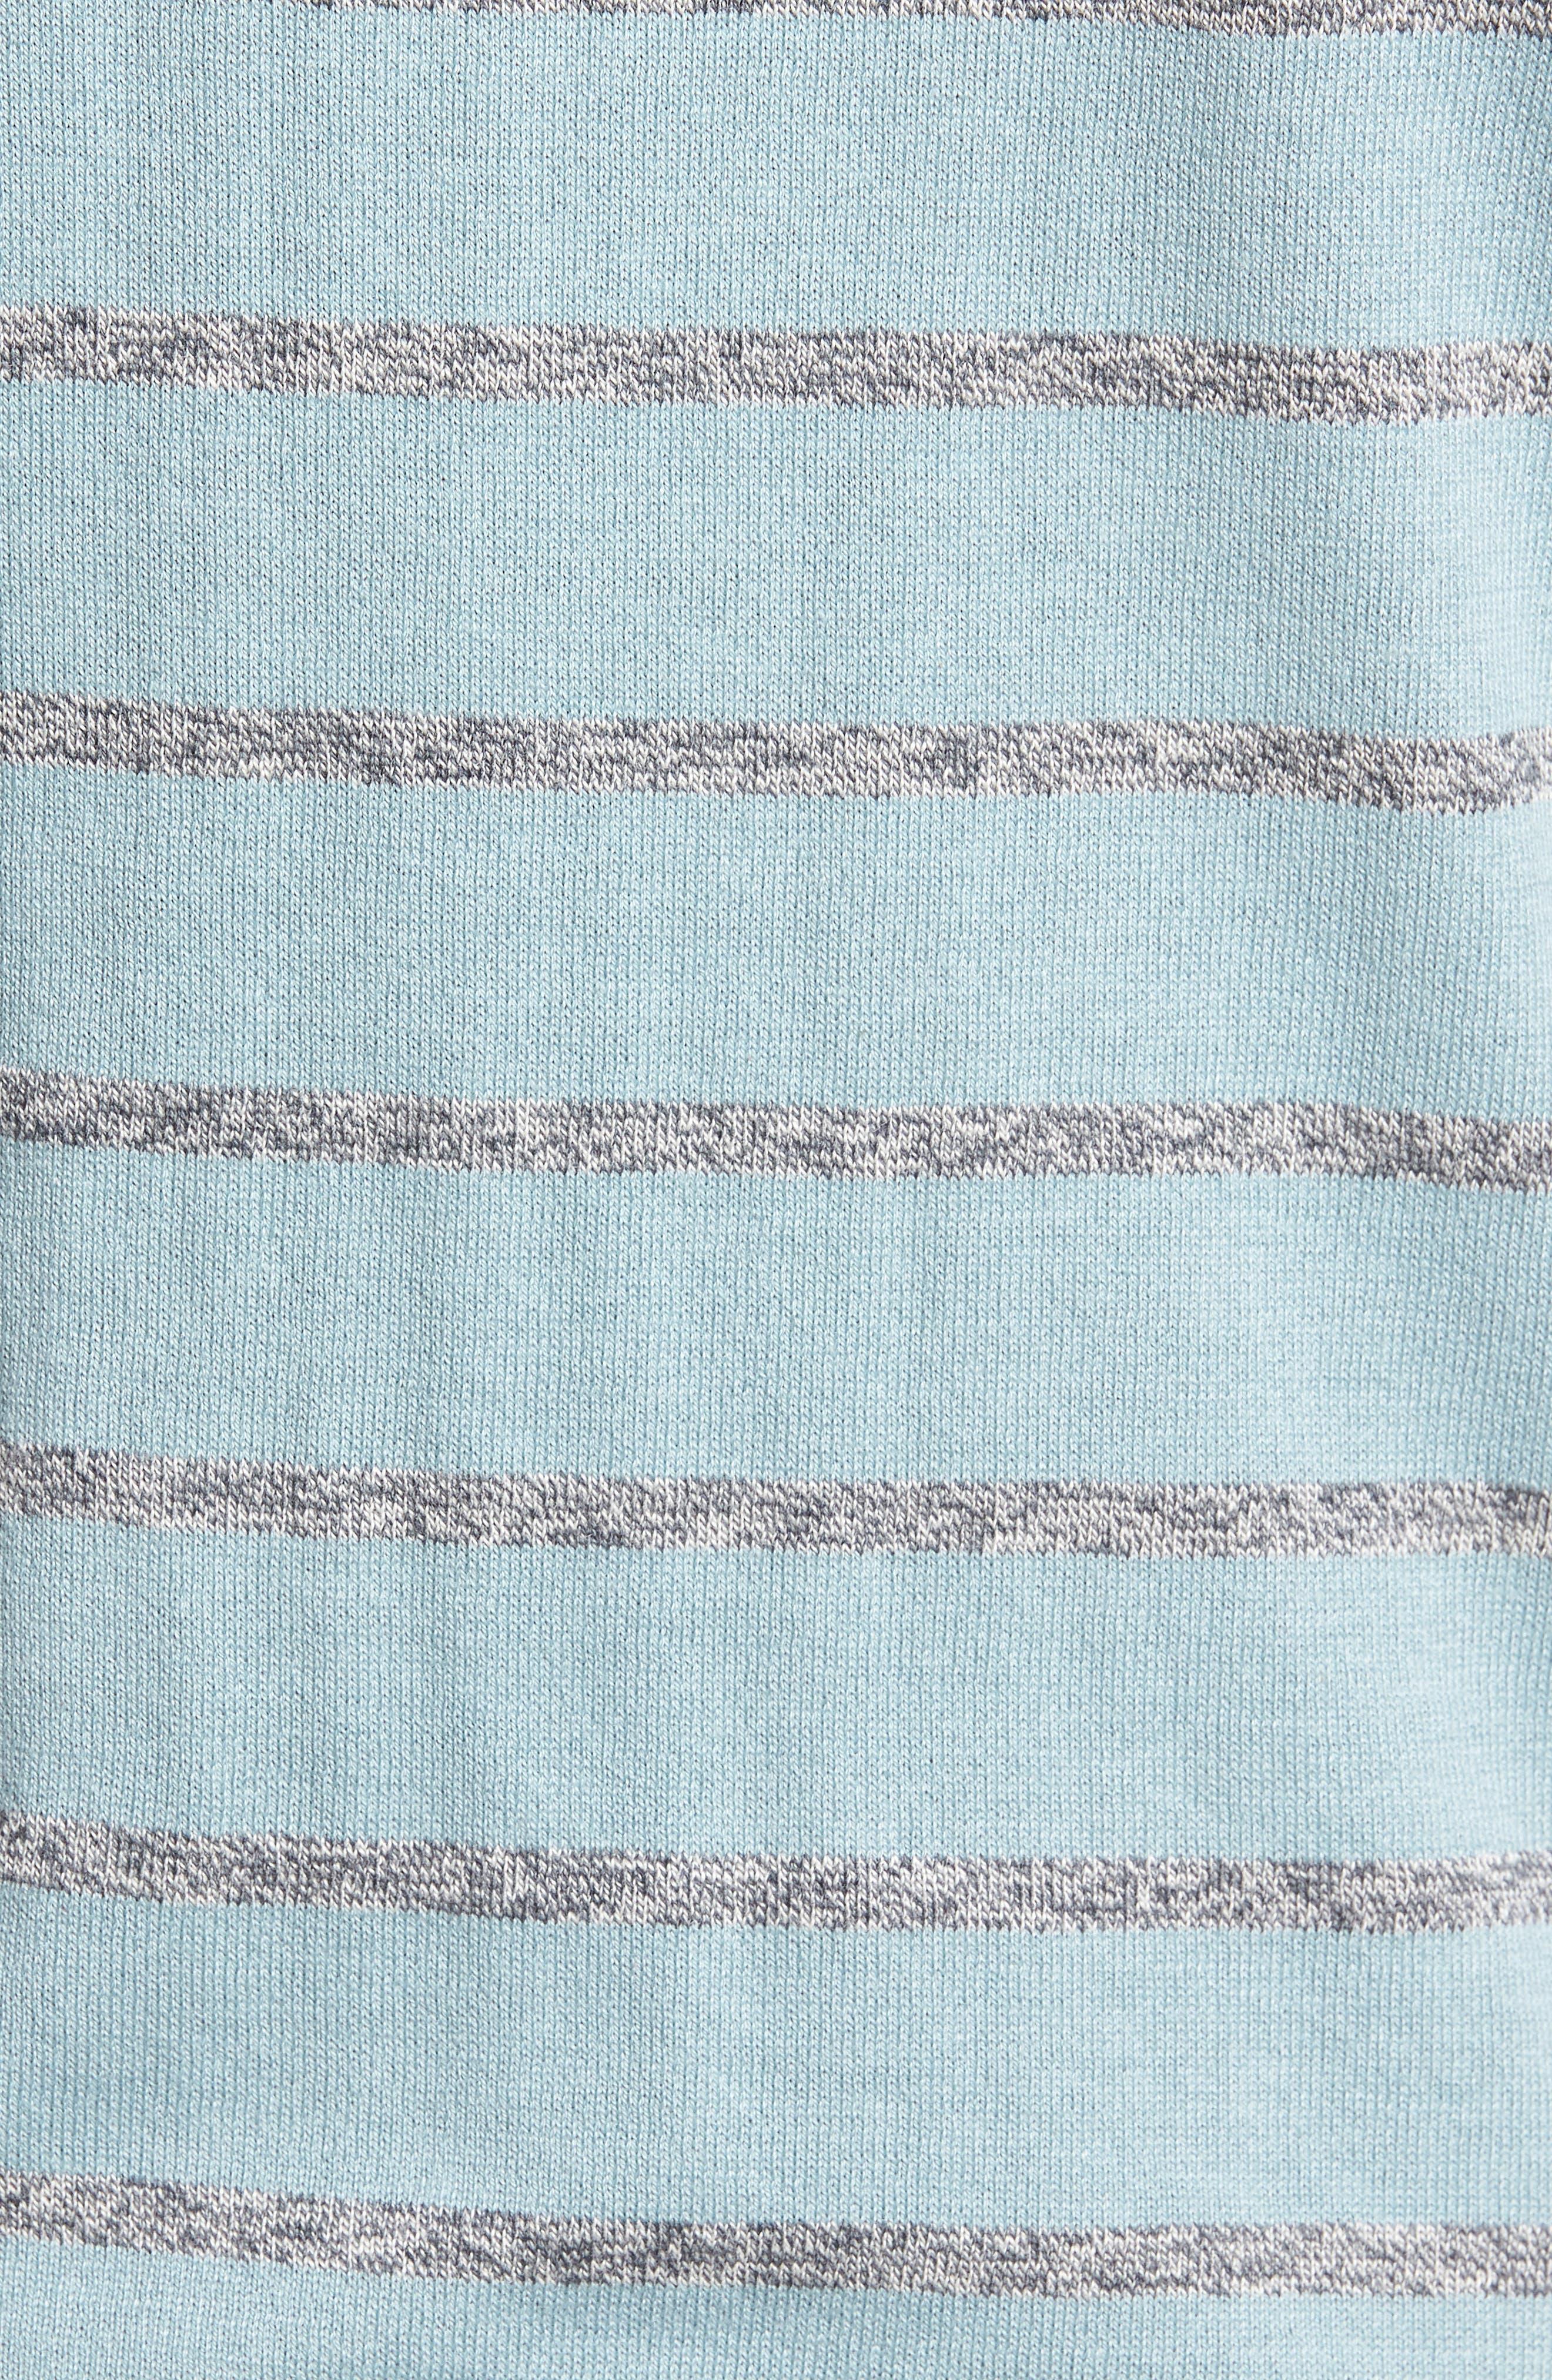 Britnay Trim Fit Stripe Crewneck Sweater,                             Alternate thumbnail 5, color,                             400